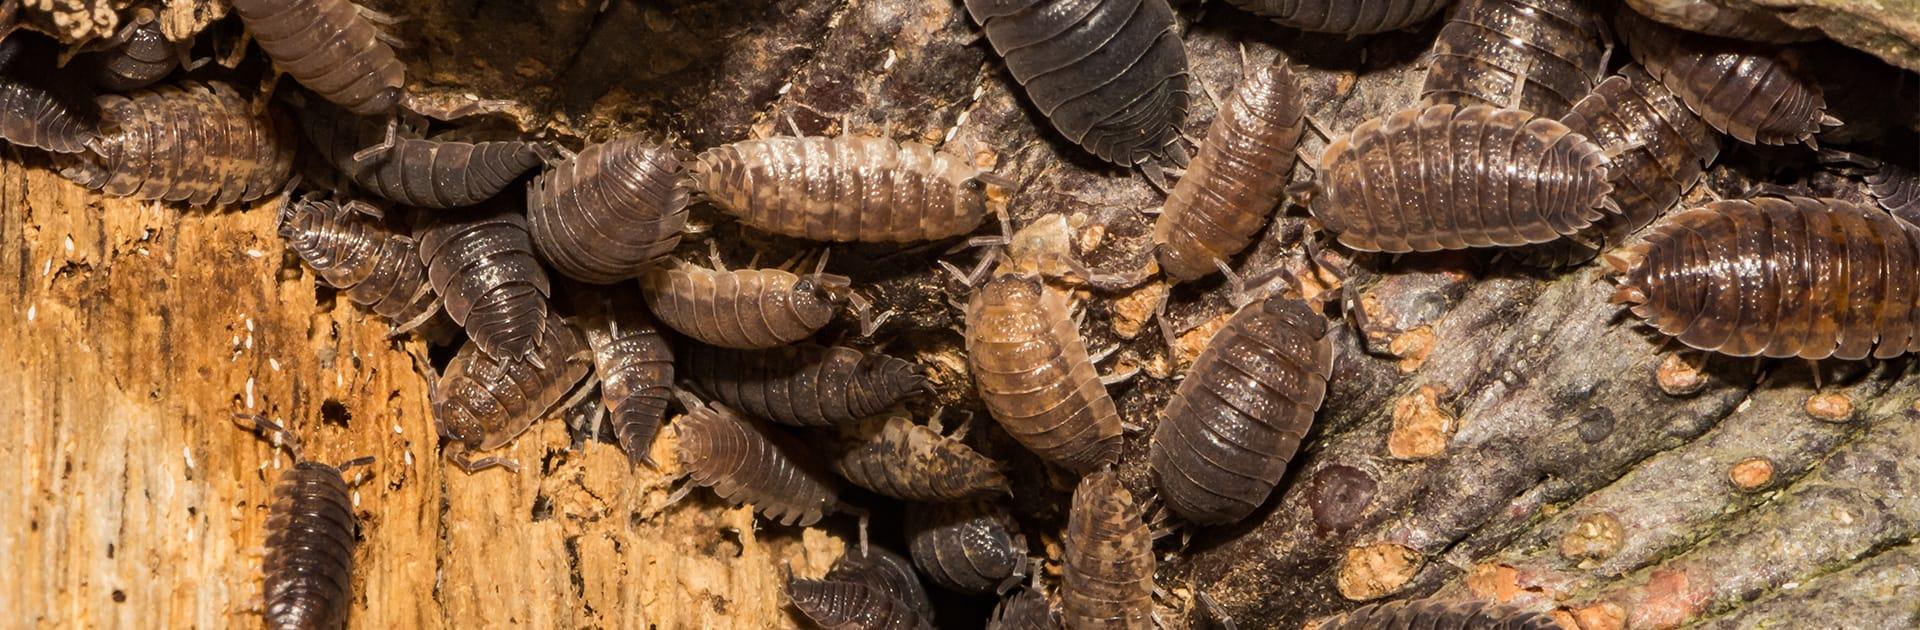 pillbugs crawling on a water damaged log